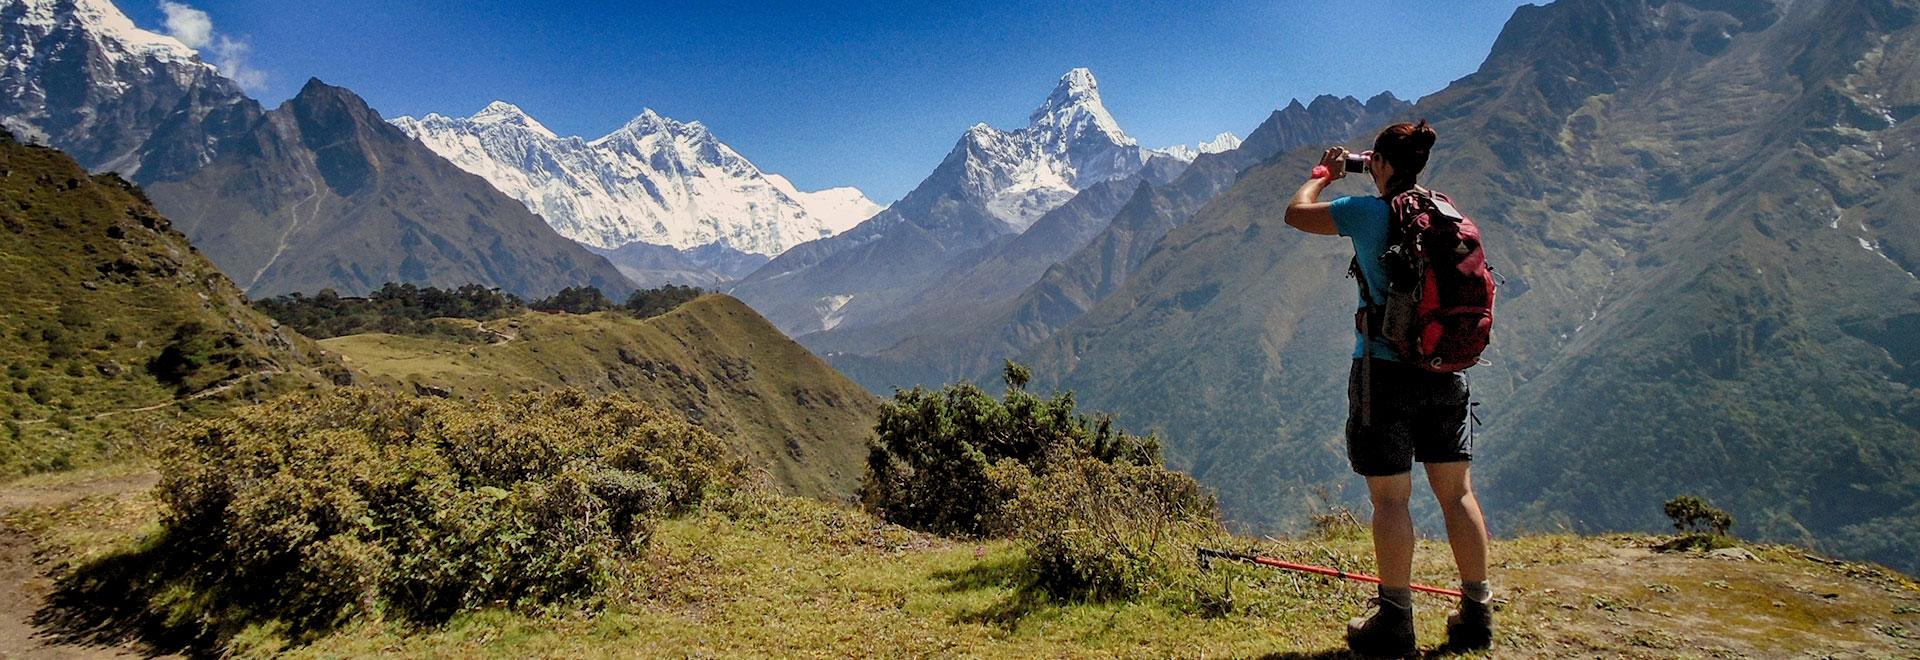 5 extreme Himalaya adventures in Nepal Including trekking